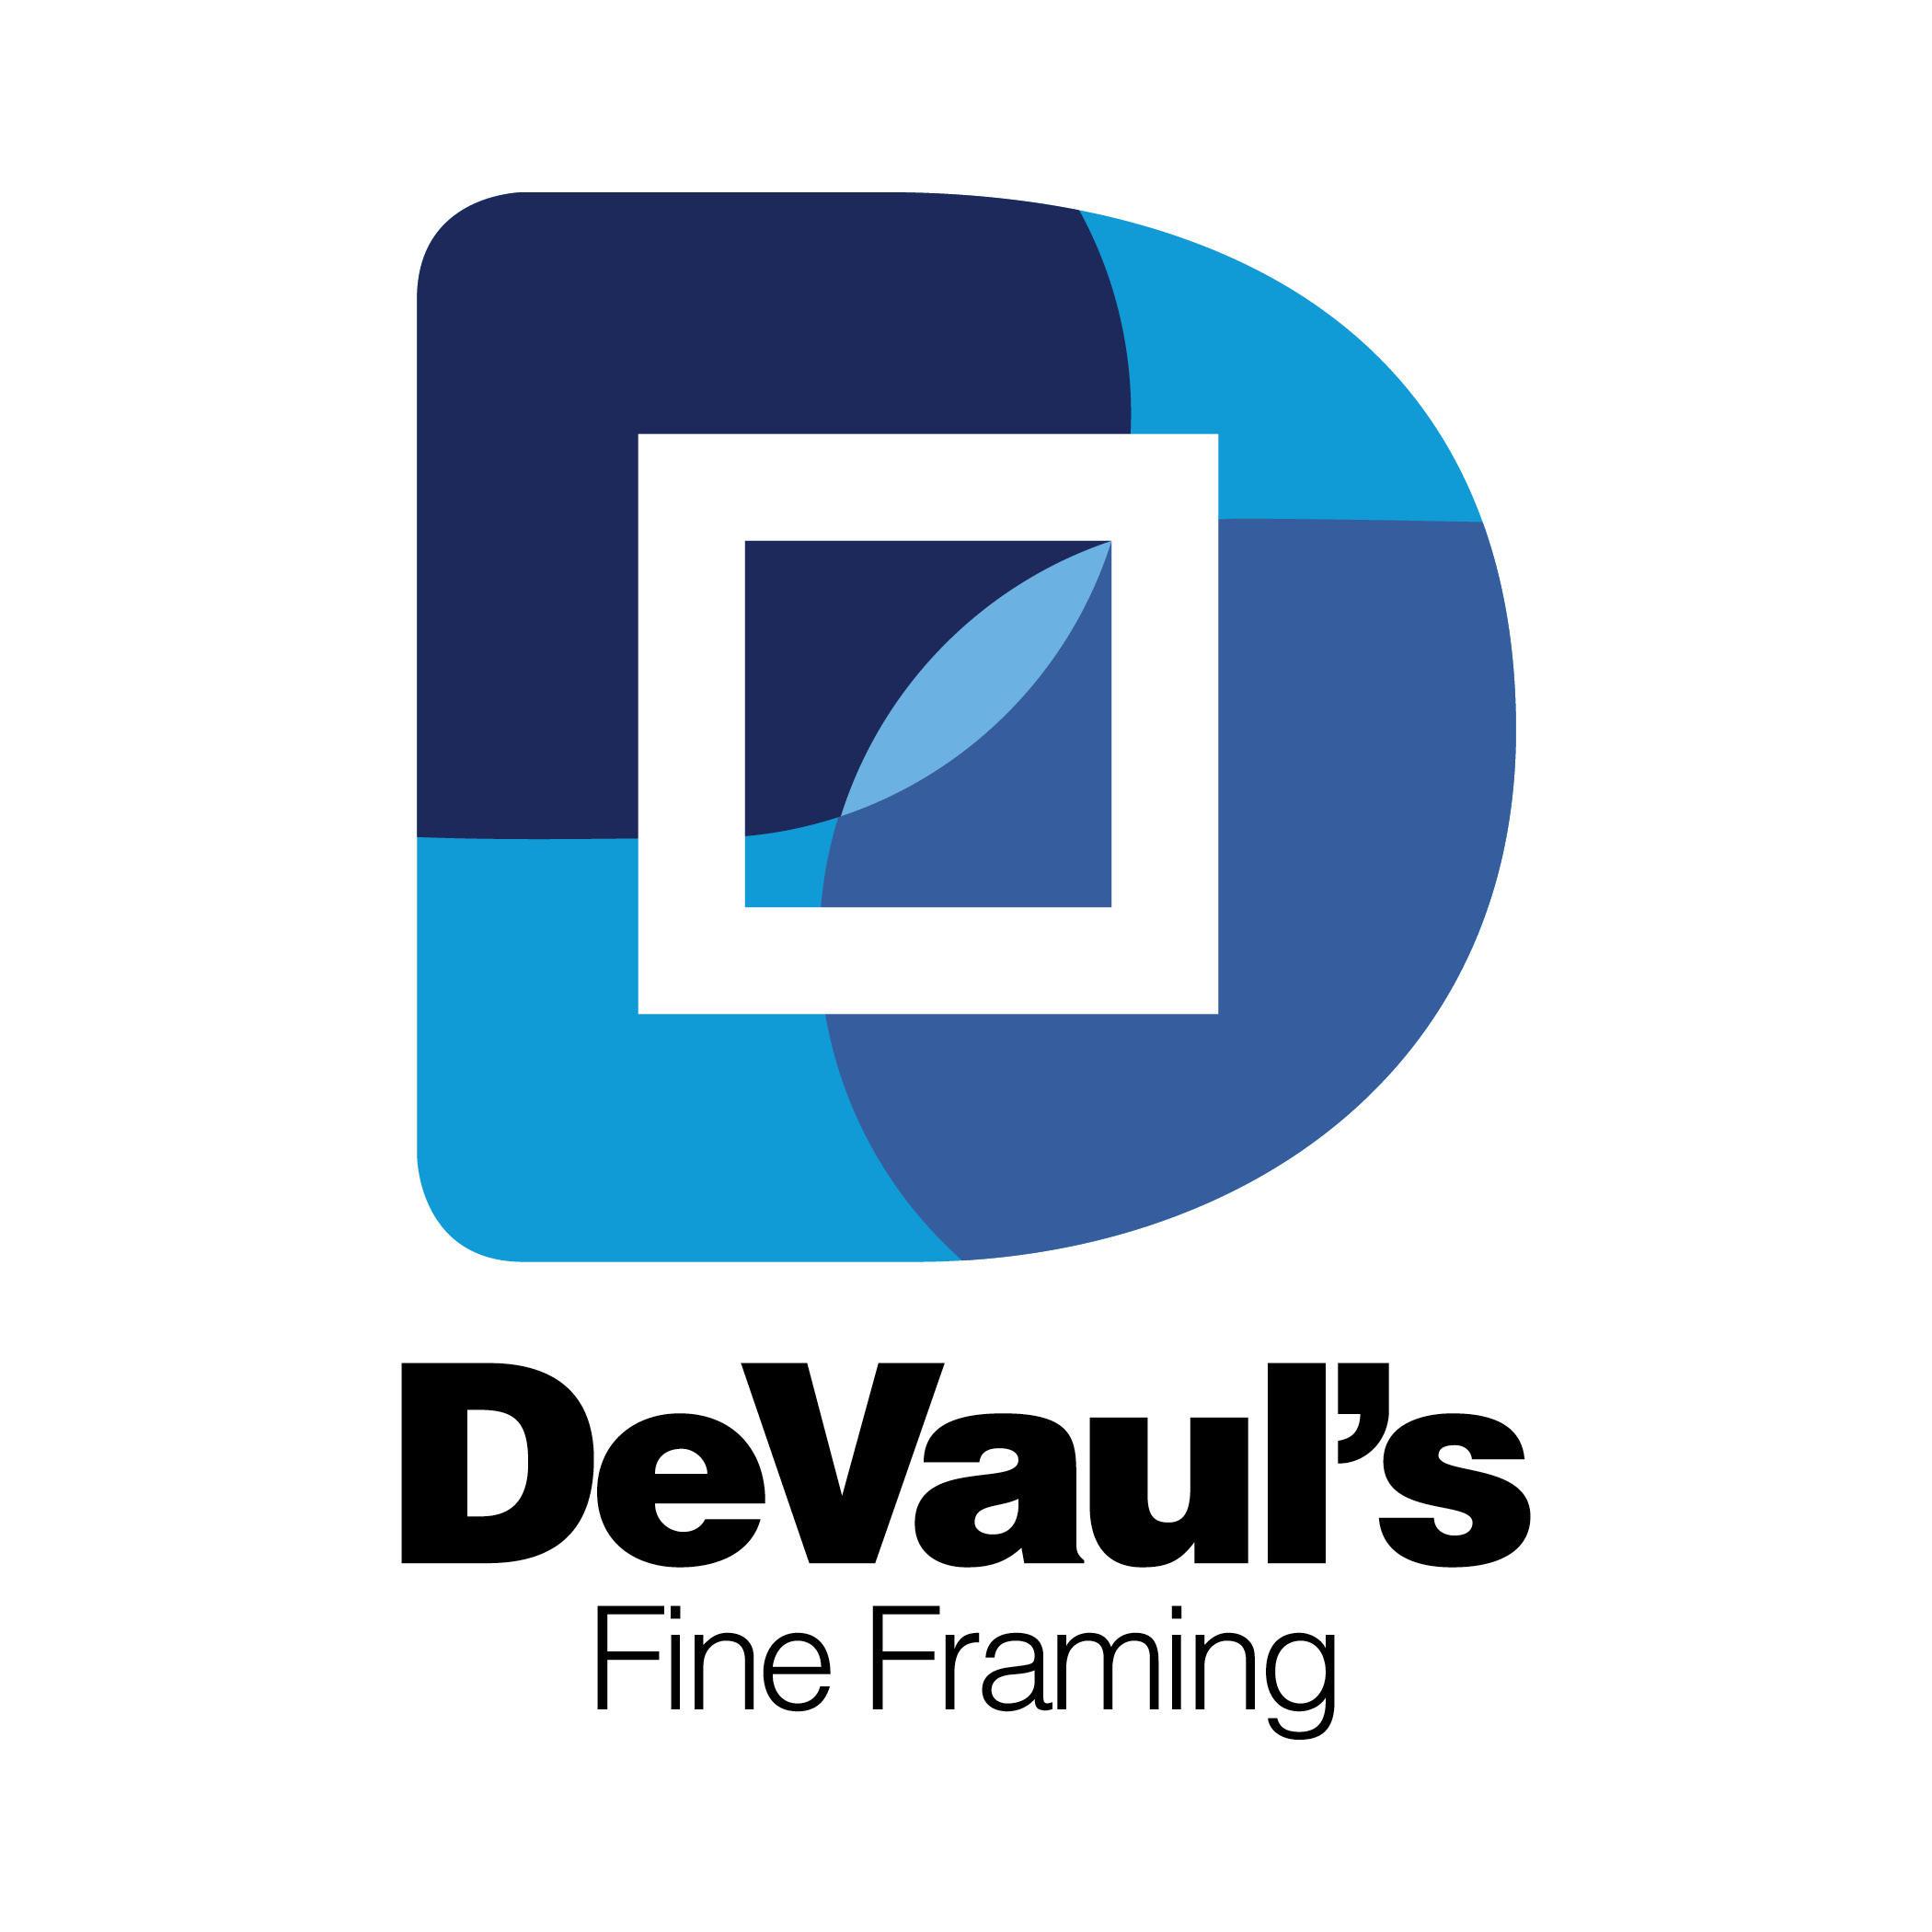 DeVaul's Fine Framing image 3